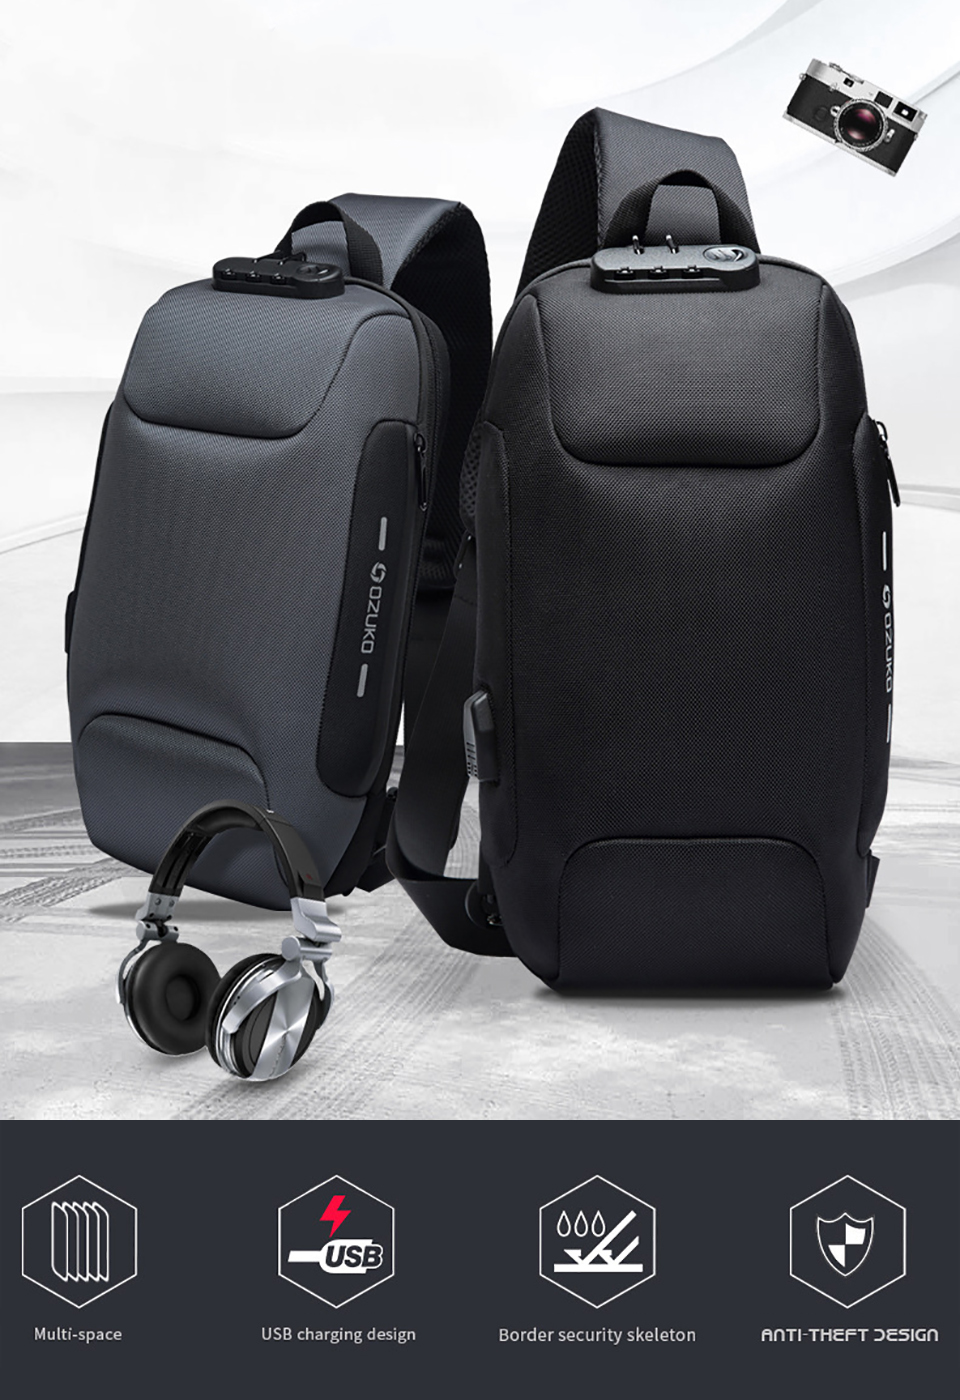 OZUKO 2019 New Multifunction Crossbody Bag for Men Anti-theft Shoulder Messenger Bags Male Waterproof Short Trip Chest Bag Pack 2